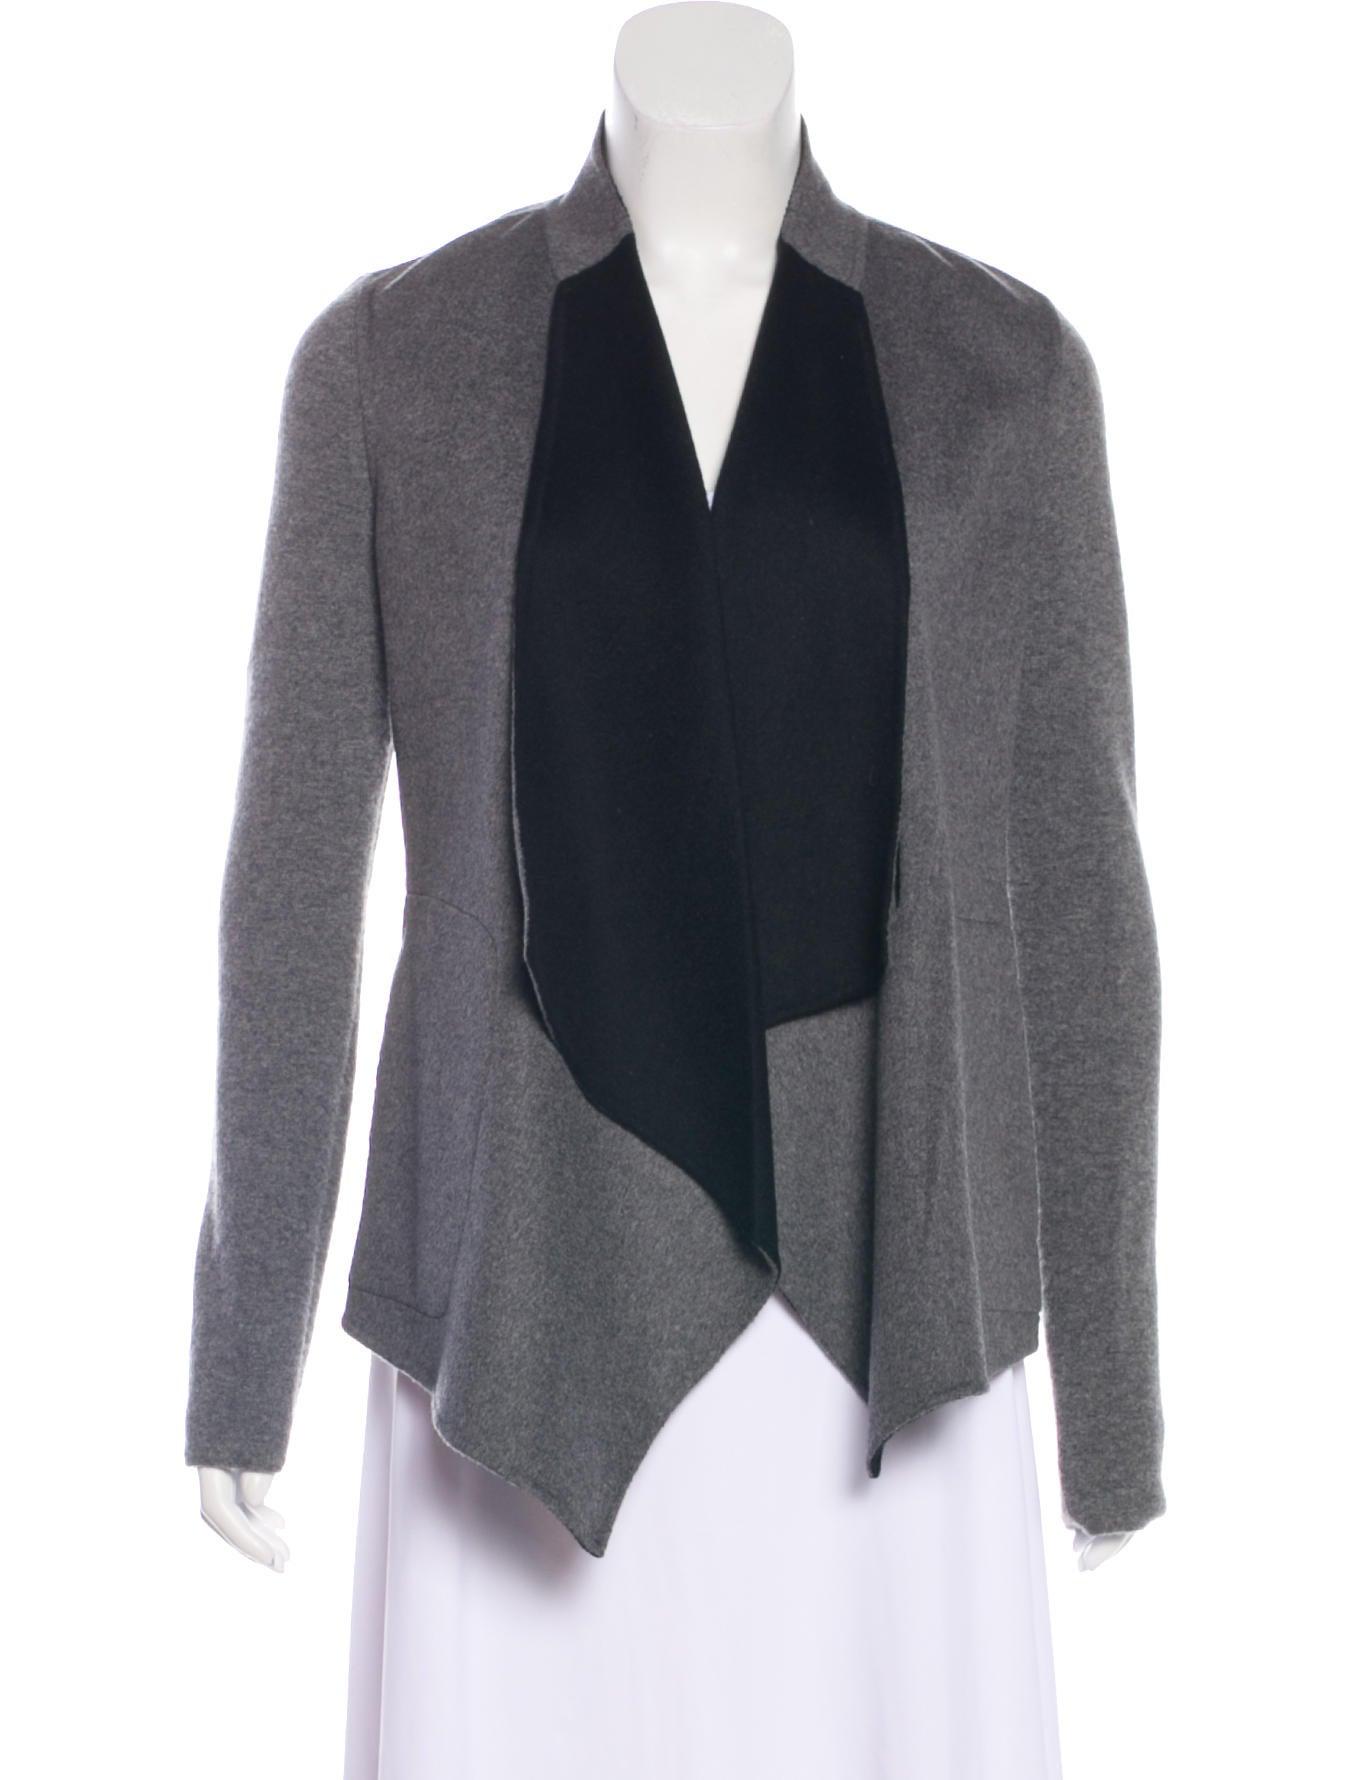 Neiman Marcus Cashmere Colorblock Cardigan Clothing Nemrc20918